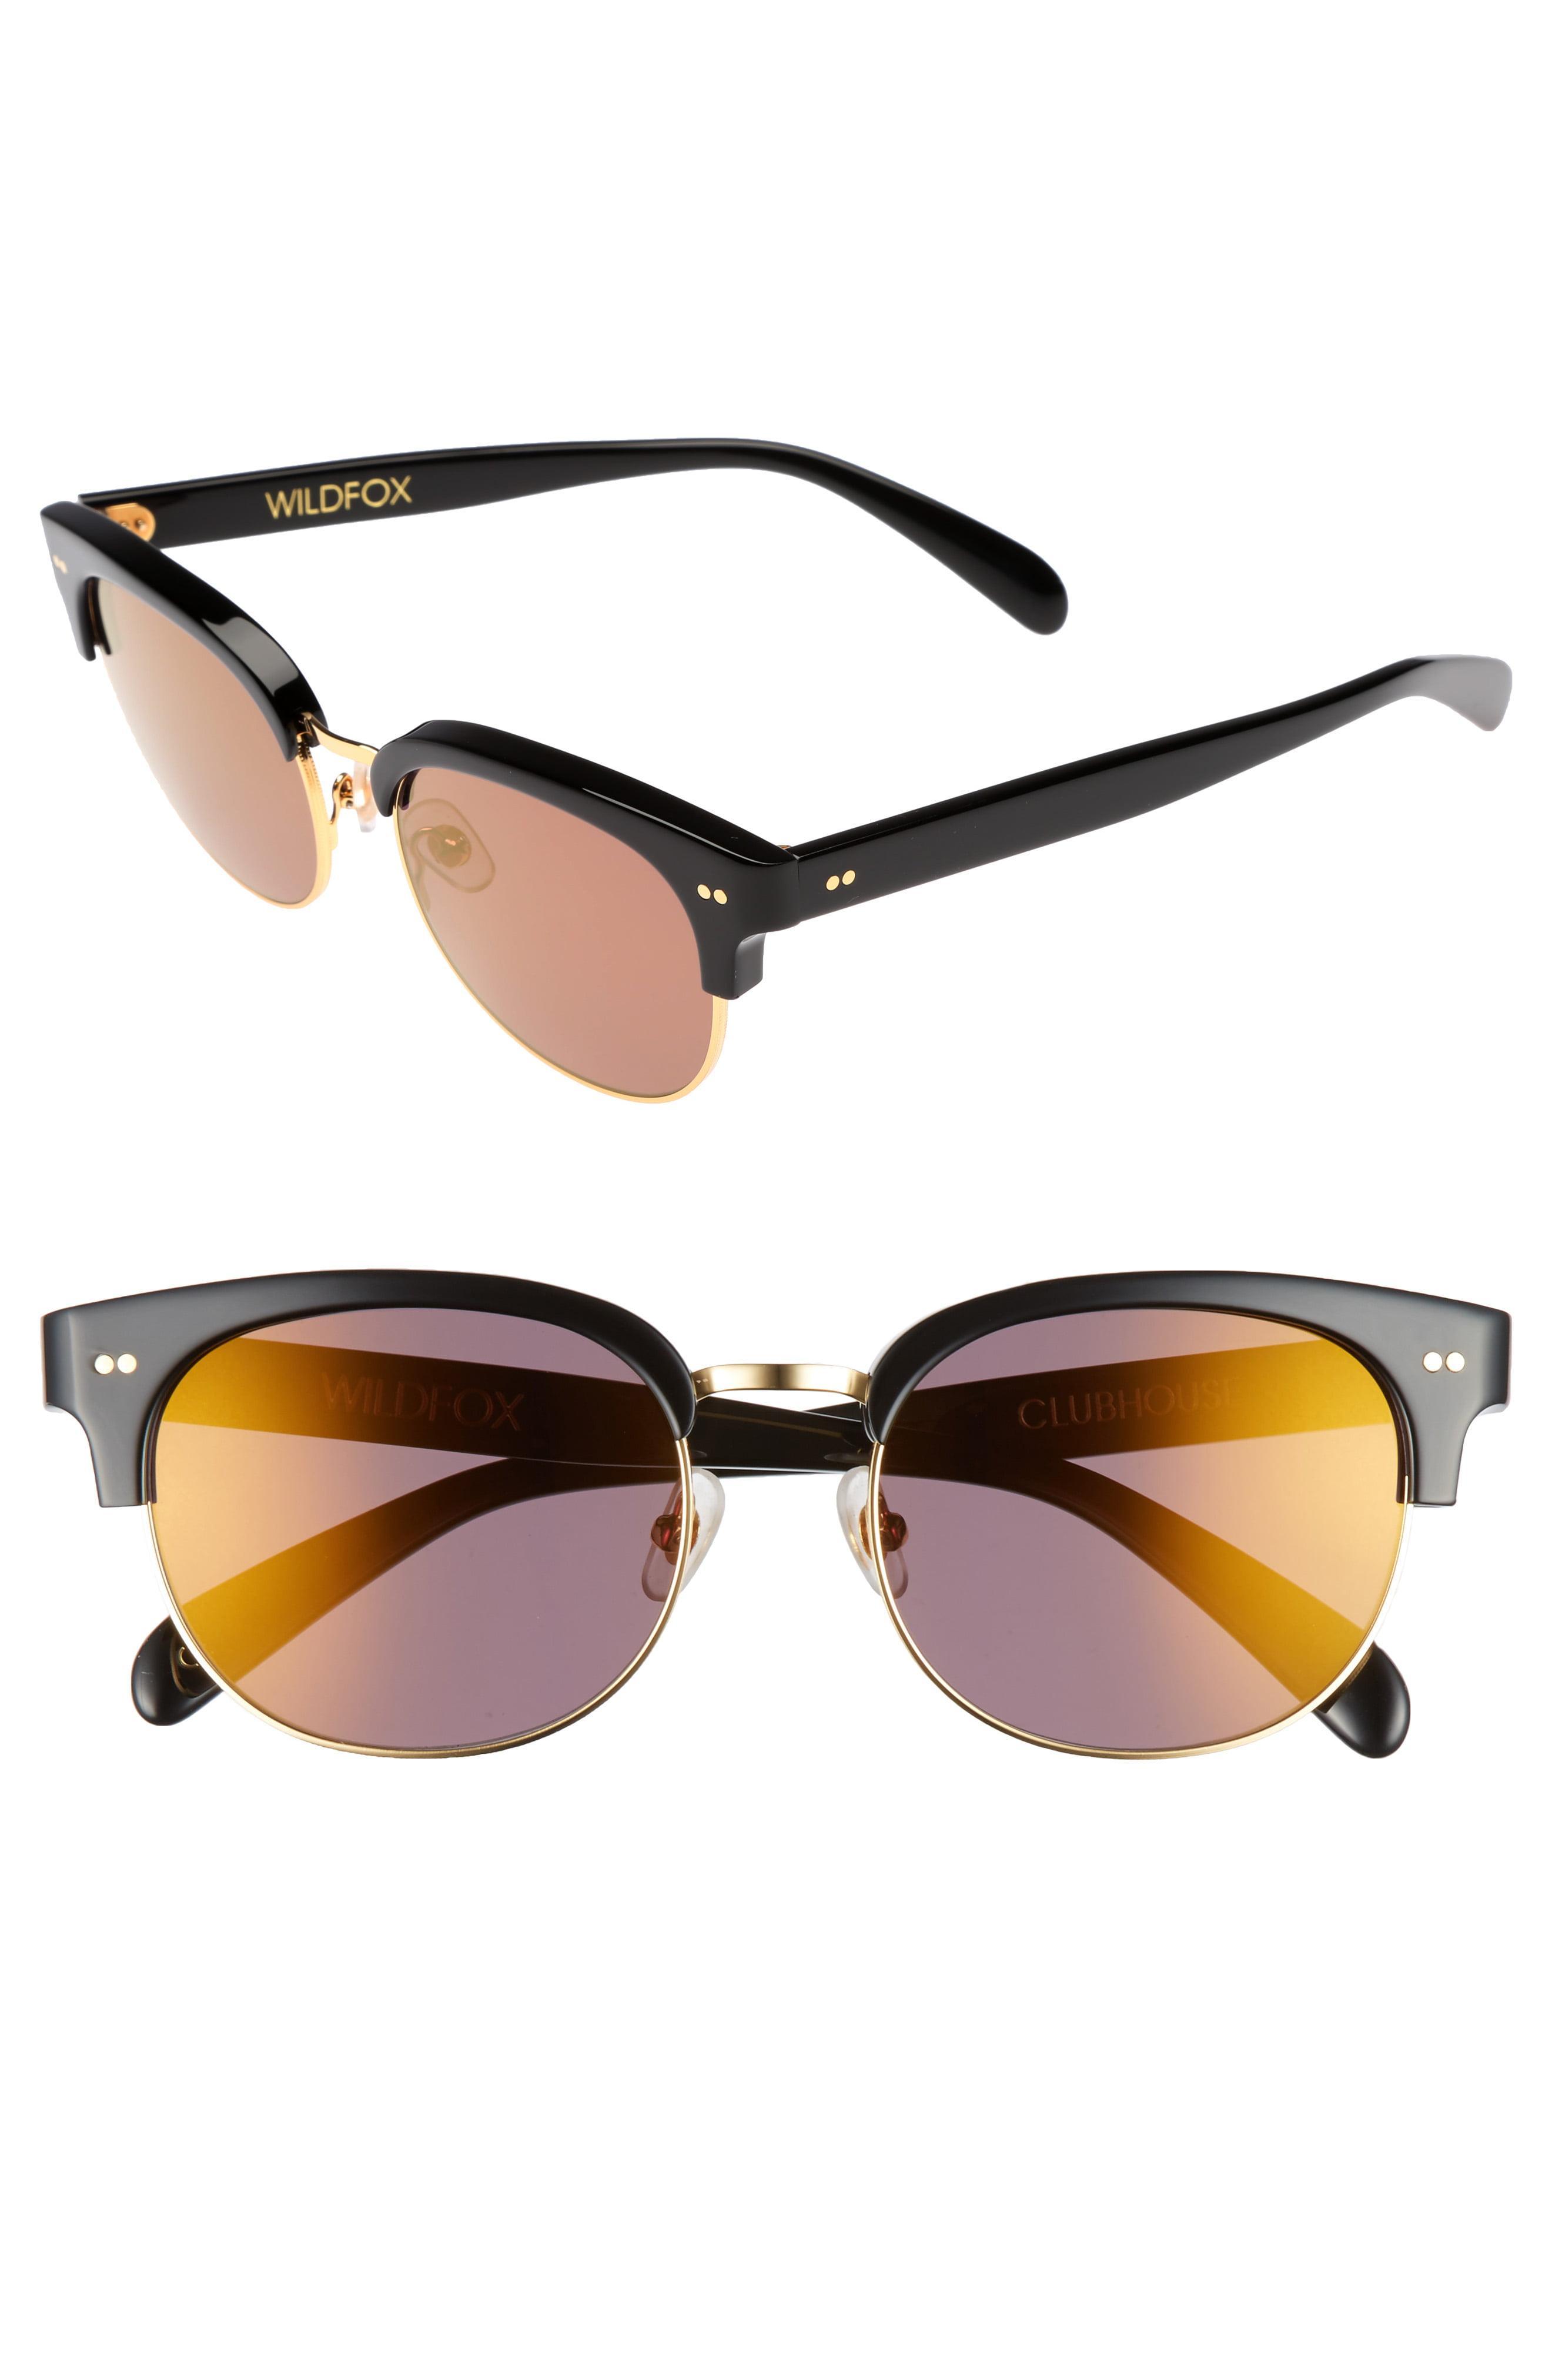 563b784d231e2 Lyst - Wildfox Clubhouse 50mm Semi-rimless Sunglasses - in Blue